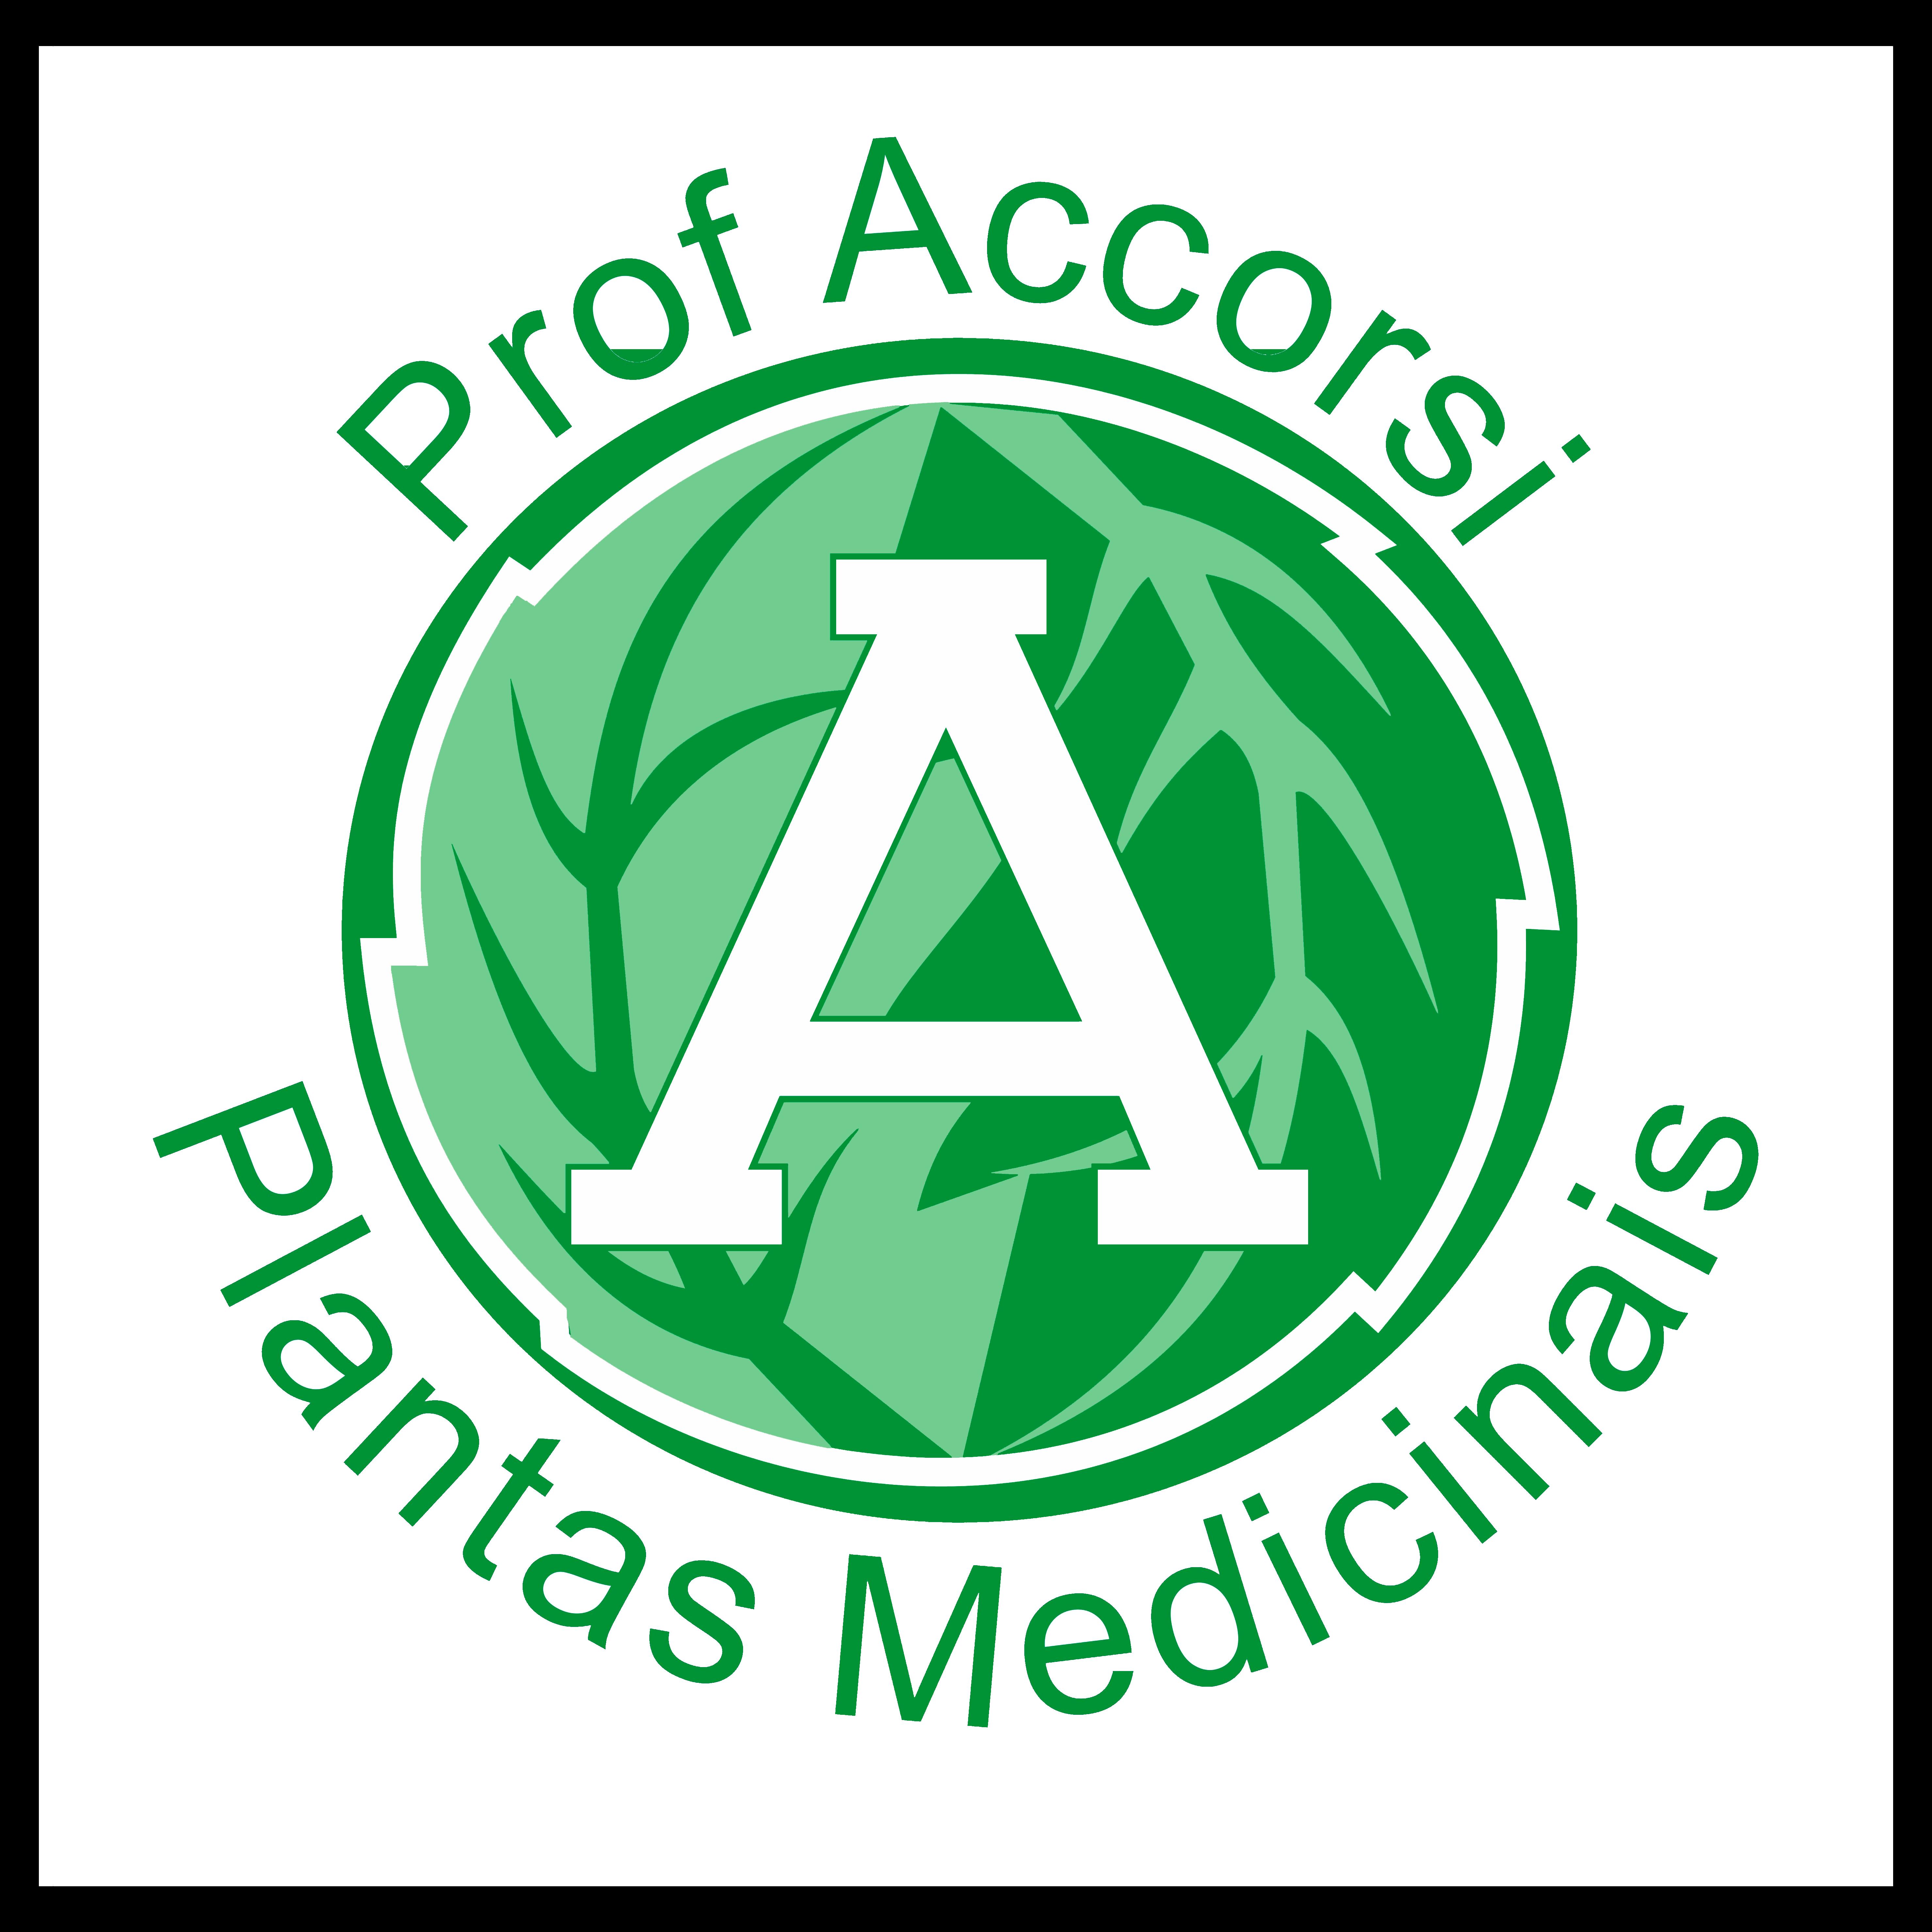 Prof. Accorsi Plantas Medicinais